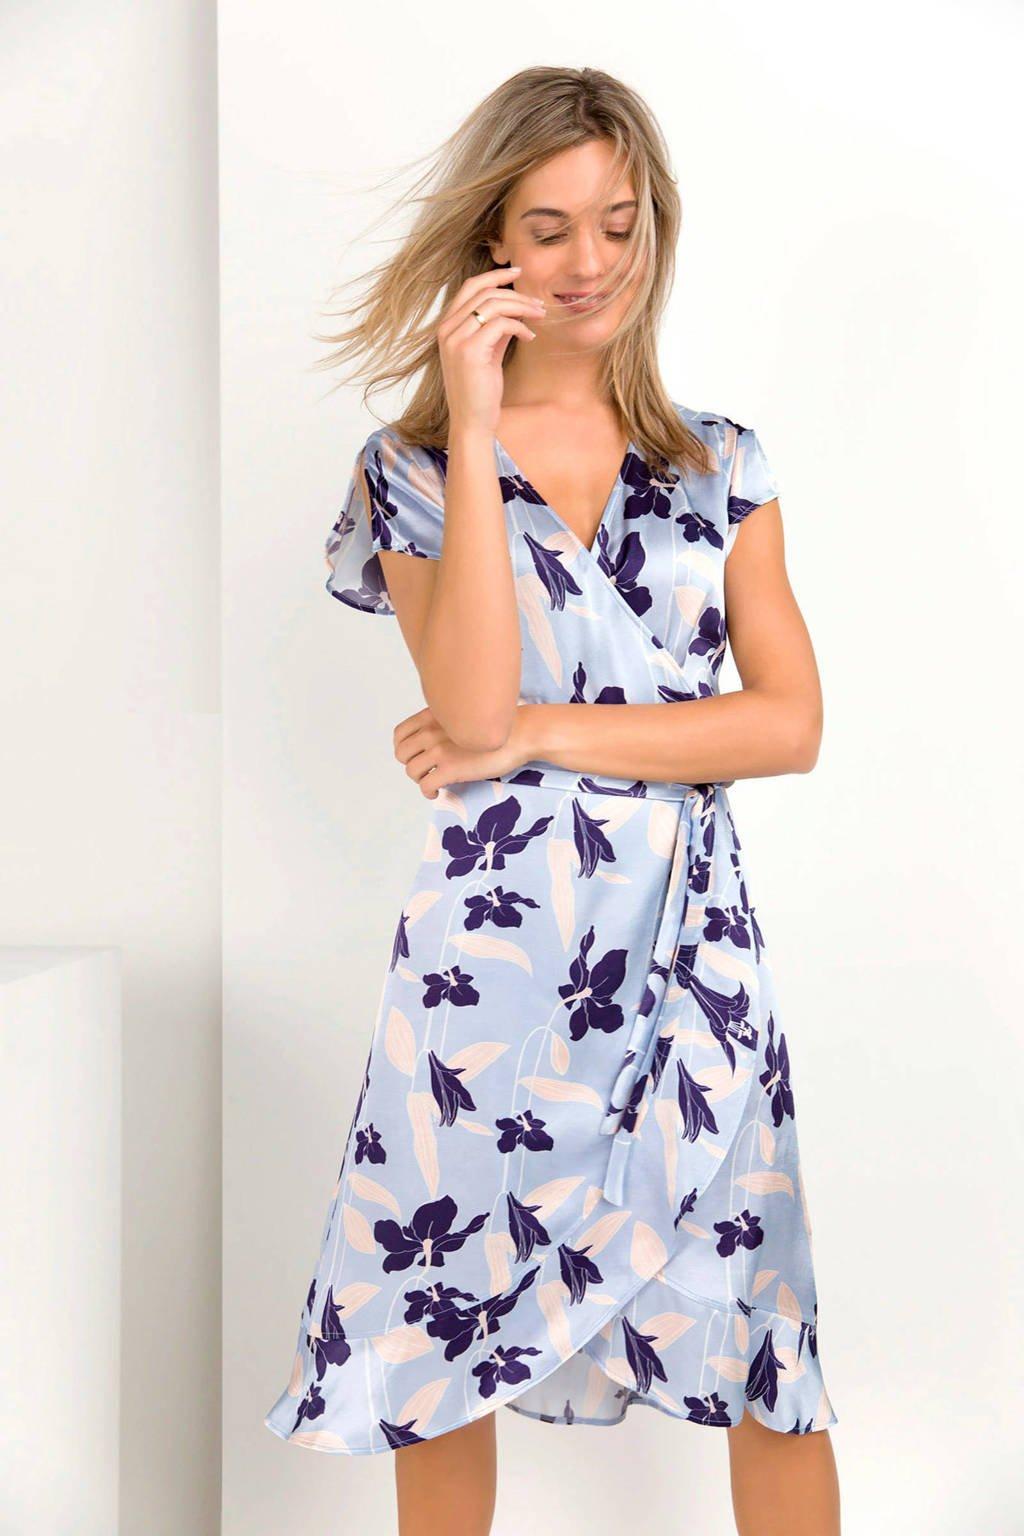 Expresso Gelsy gebloemde overslag jurk, Lichtblauw/donkerblauw